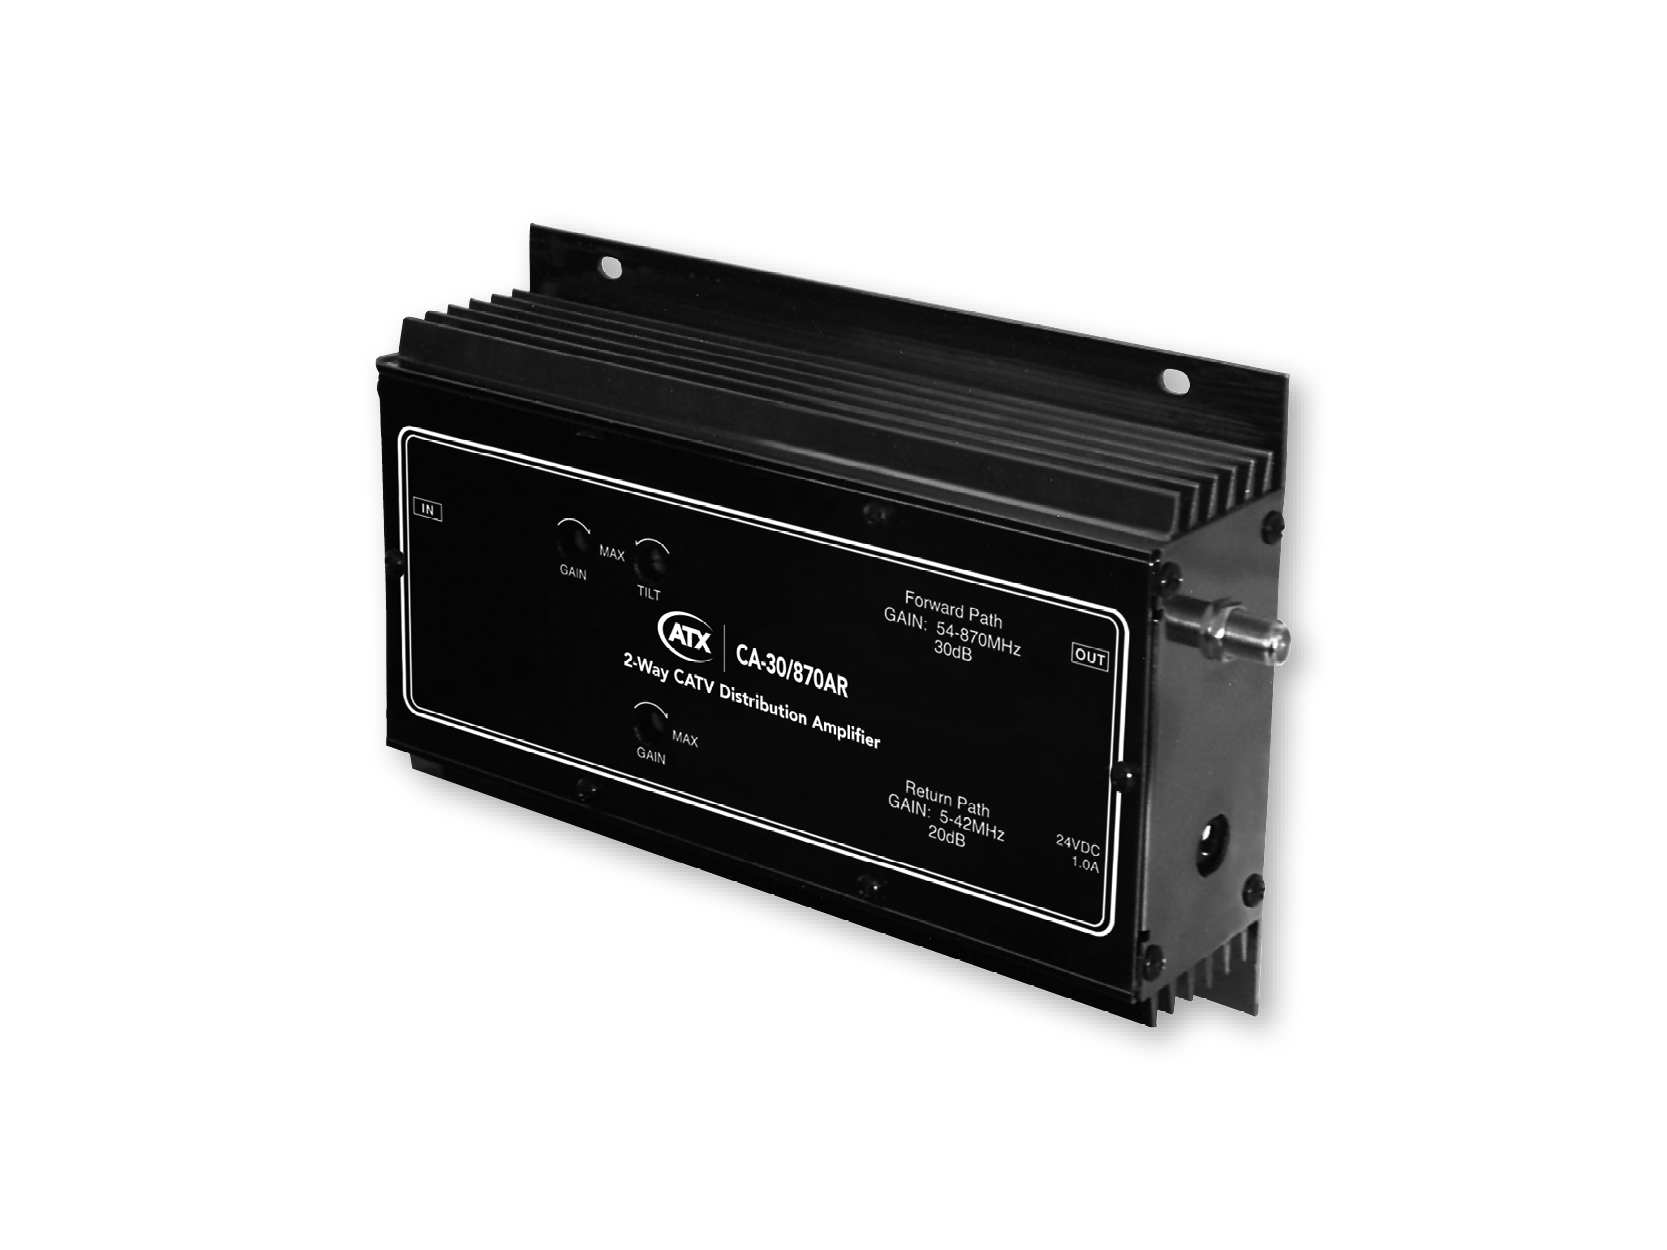 CA-30/870AR: 870 MHz Bidirectional CATV Distribution Amplifier